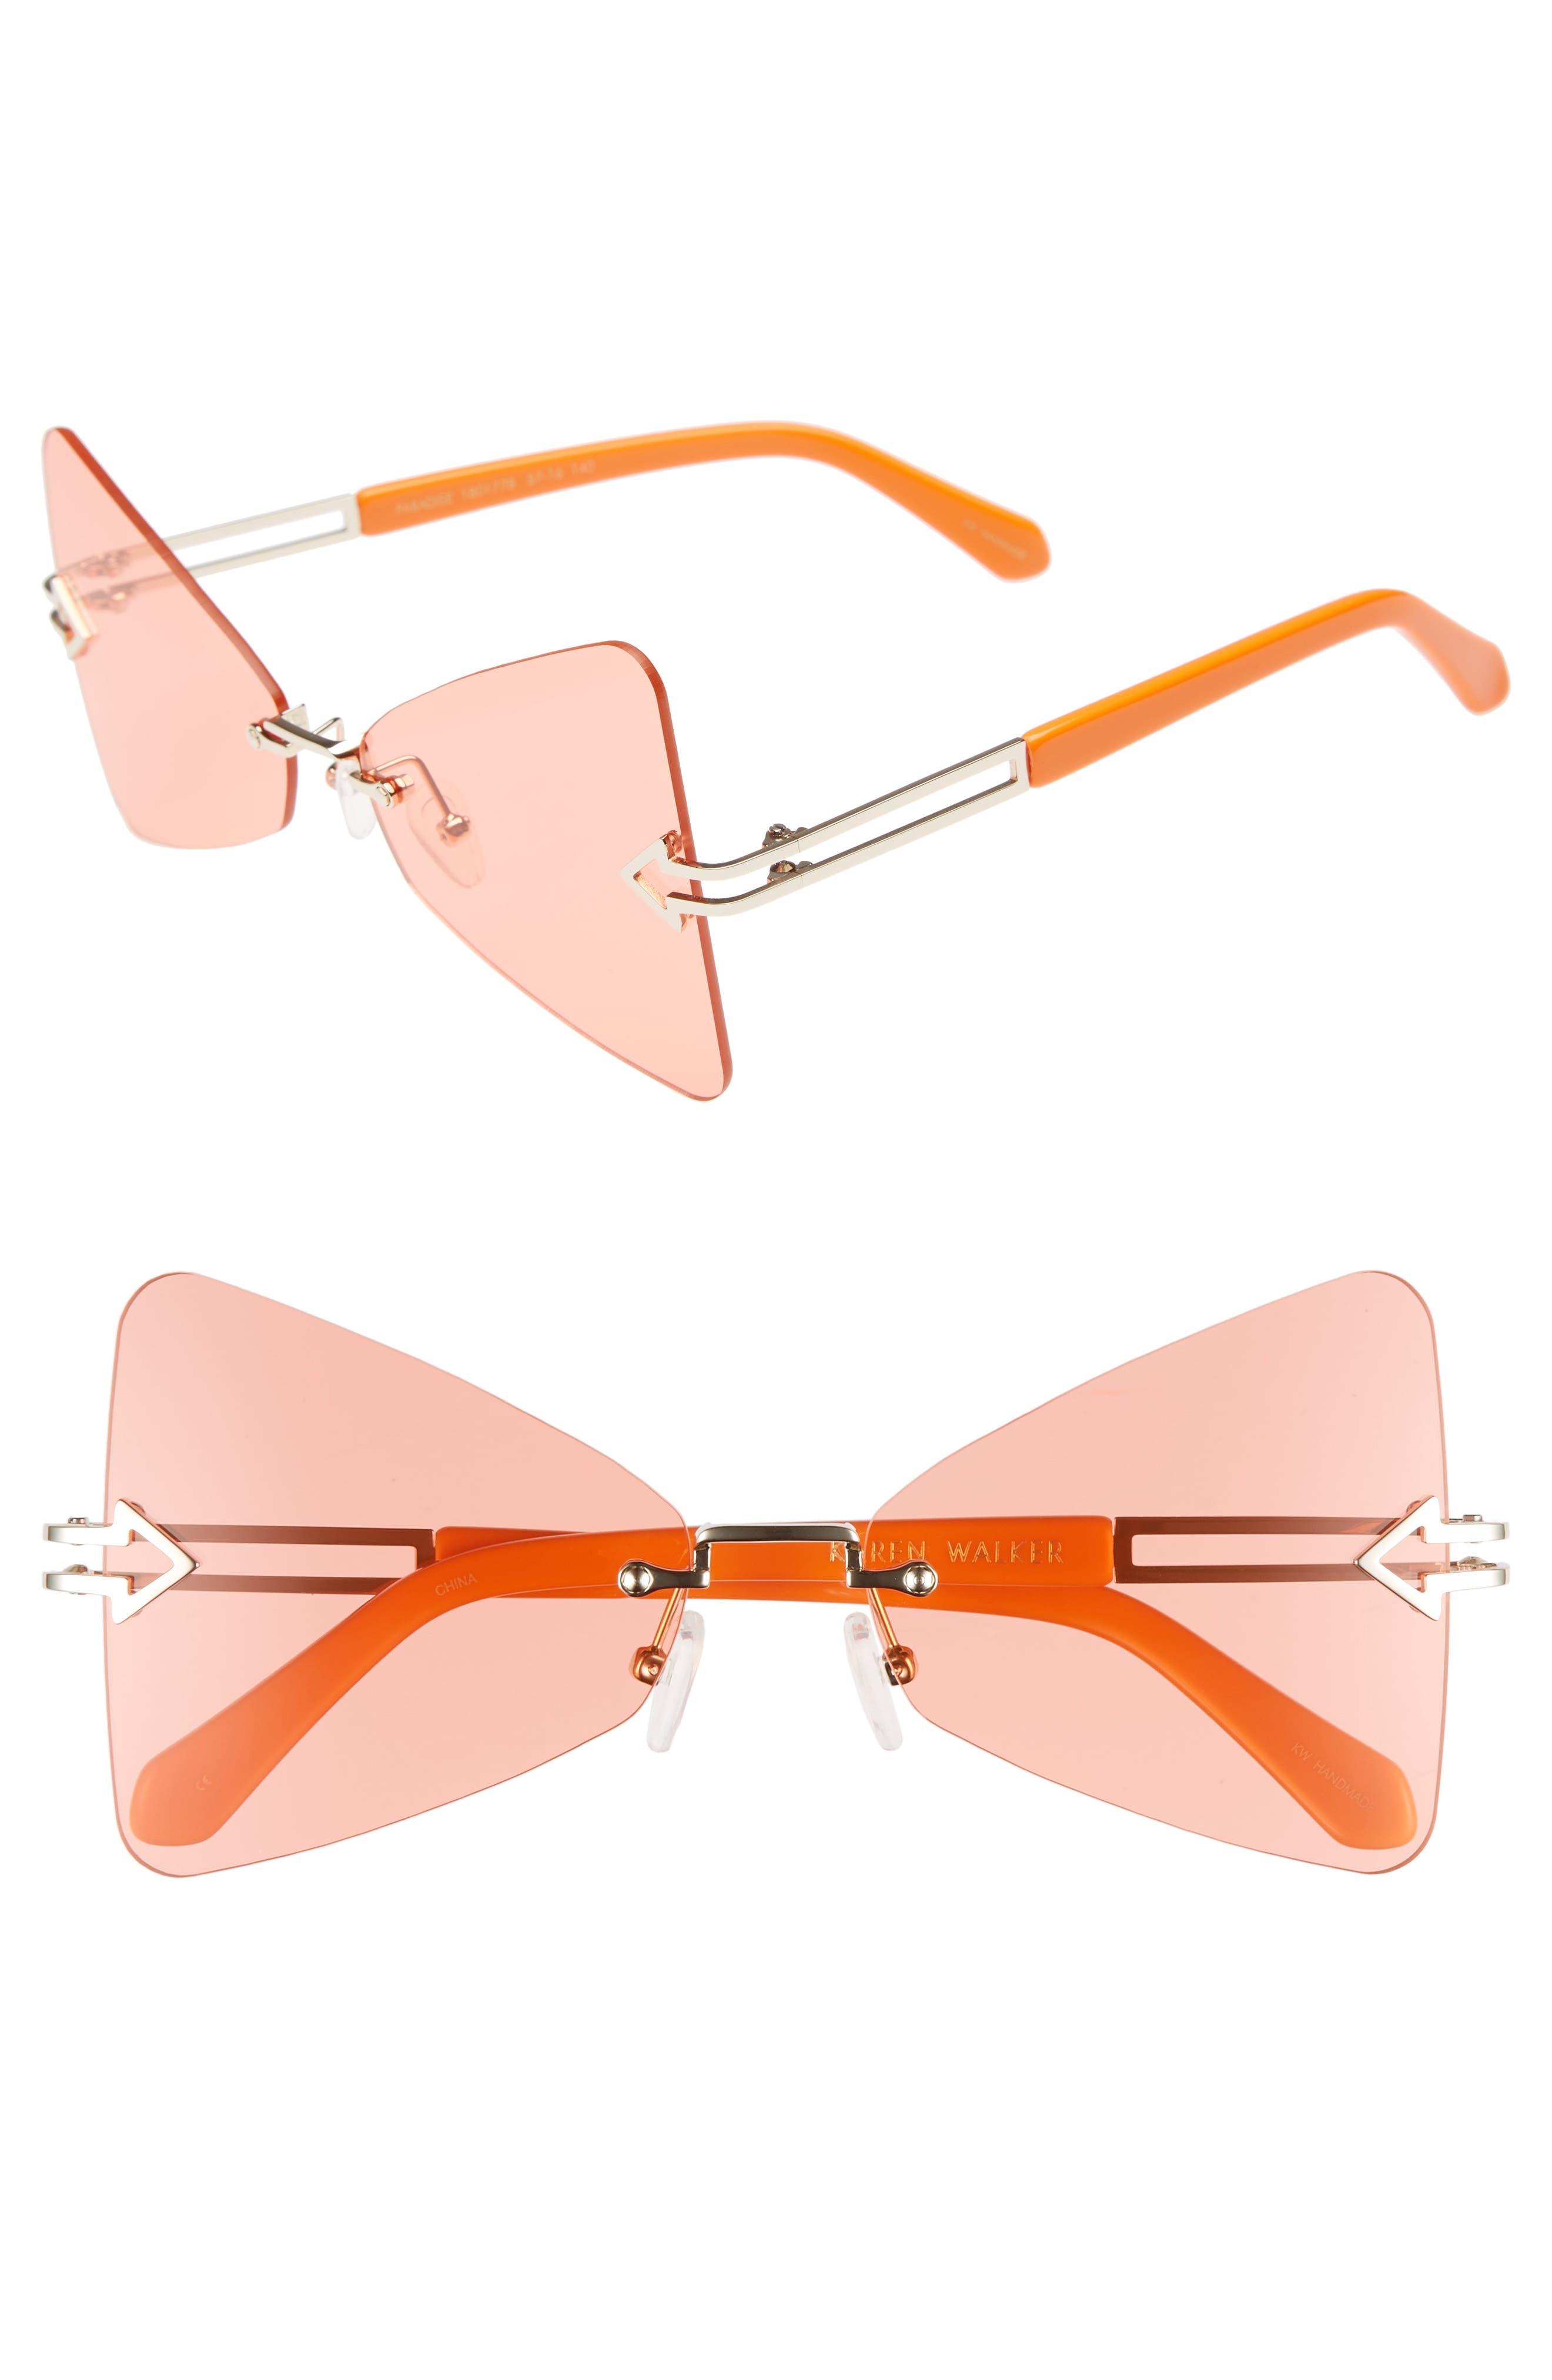 Paradise 57mm Sunglasses,                             Main thumbnail 1, color,                             Tangerine/ Coral